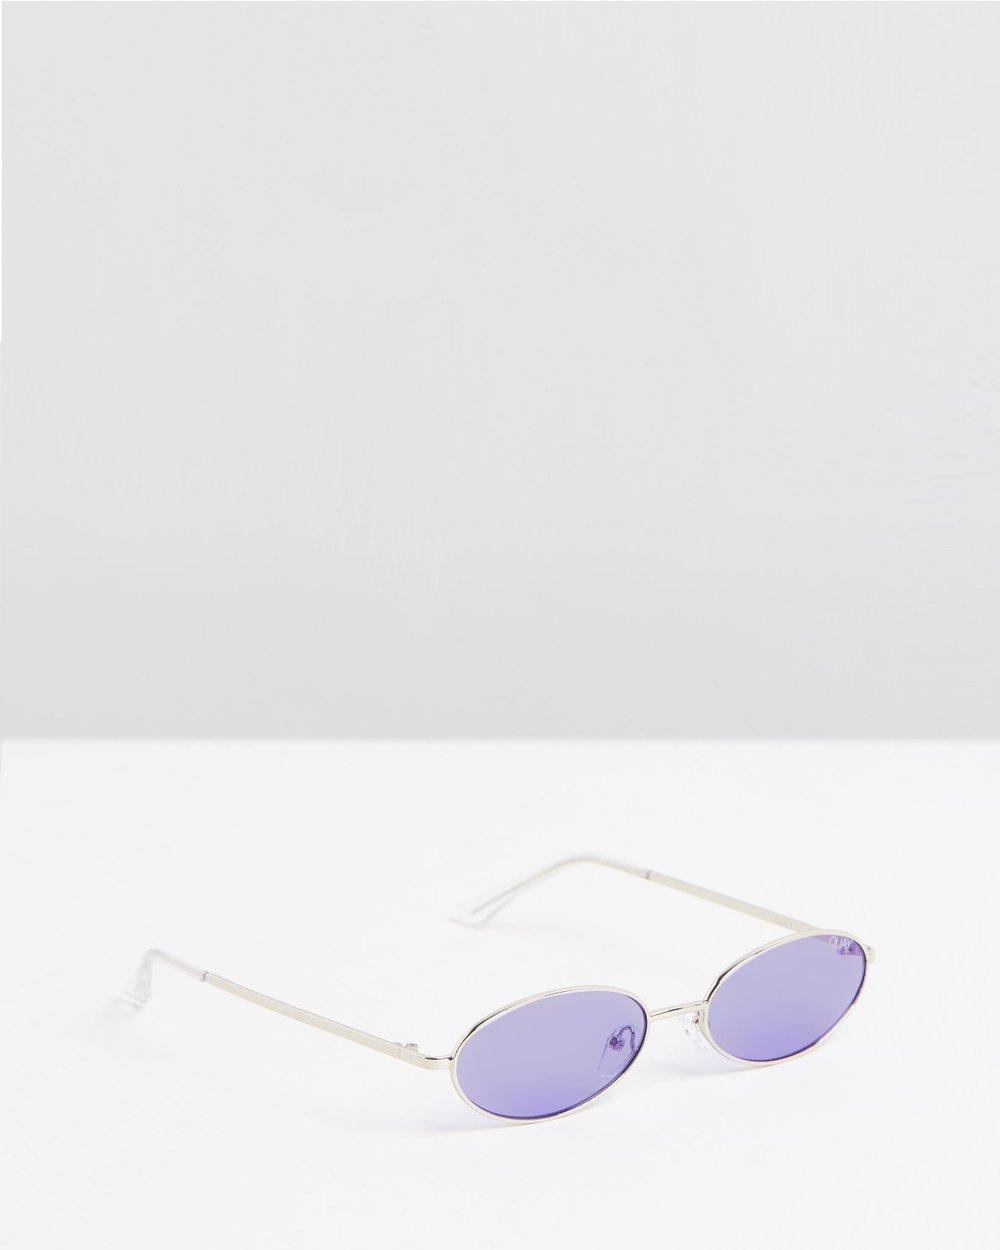 0f38e99575 Quay X Alissa Violet - Clout by Quay Australia Online